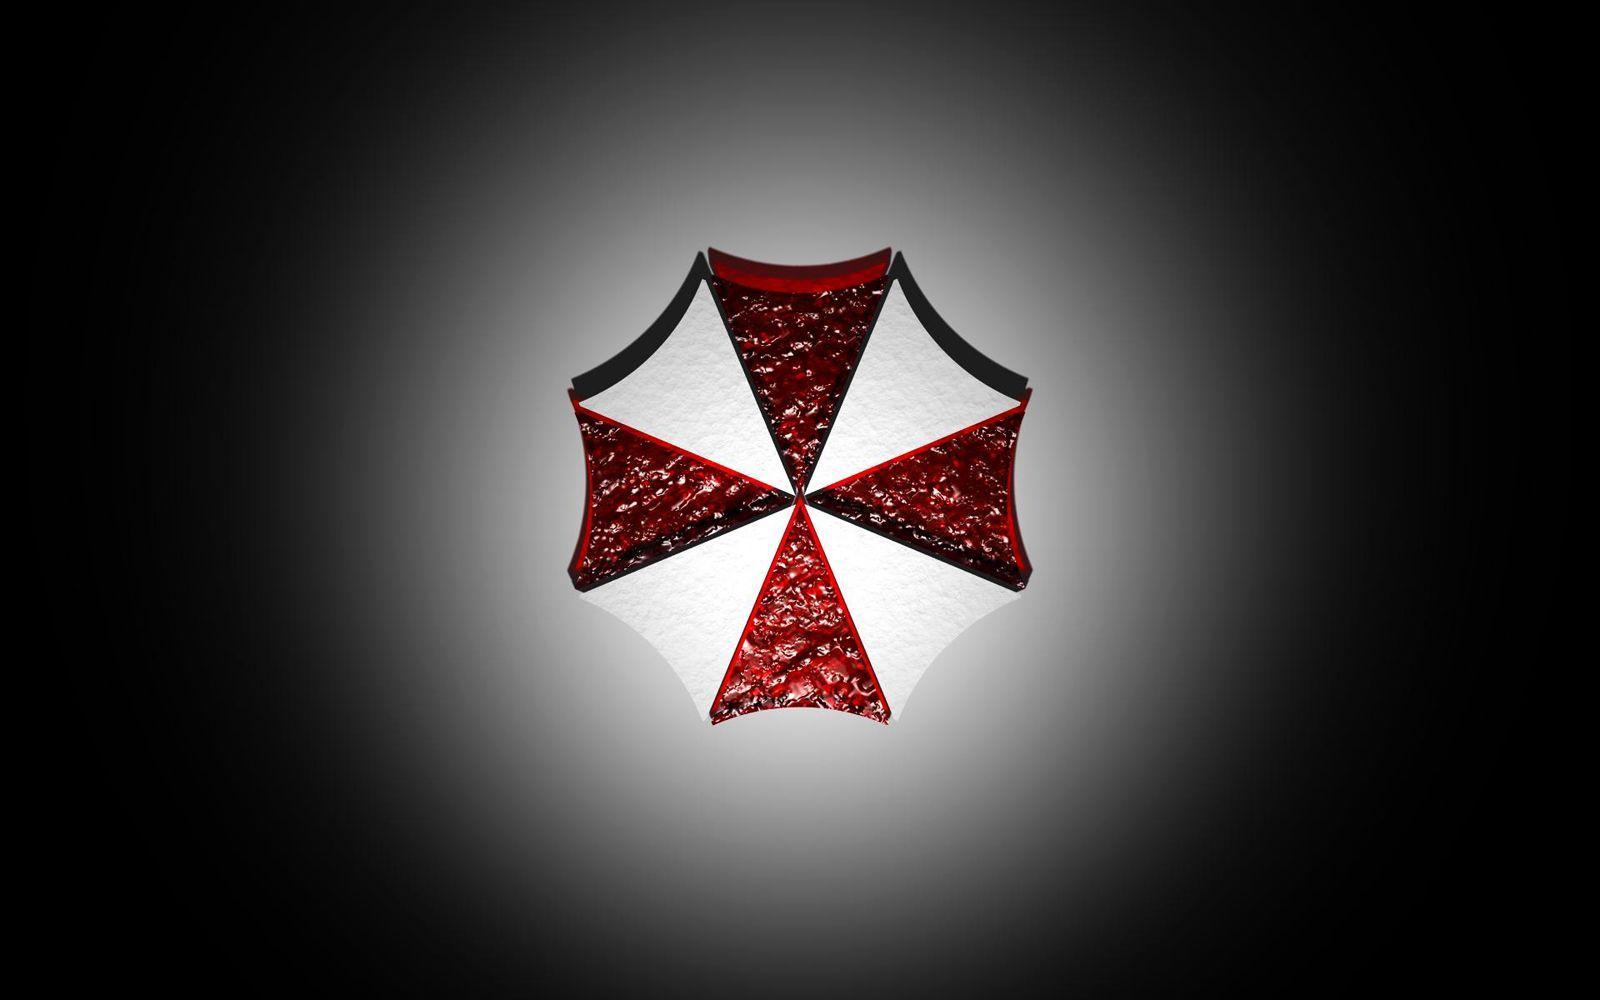 Resident Evil Umbrella Logo Wallpapers Top Free Resident